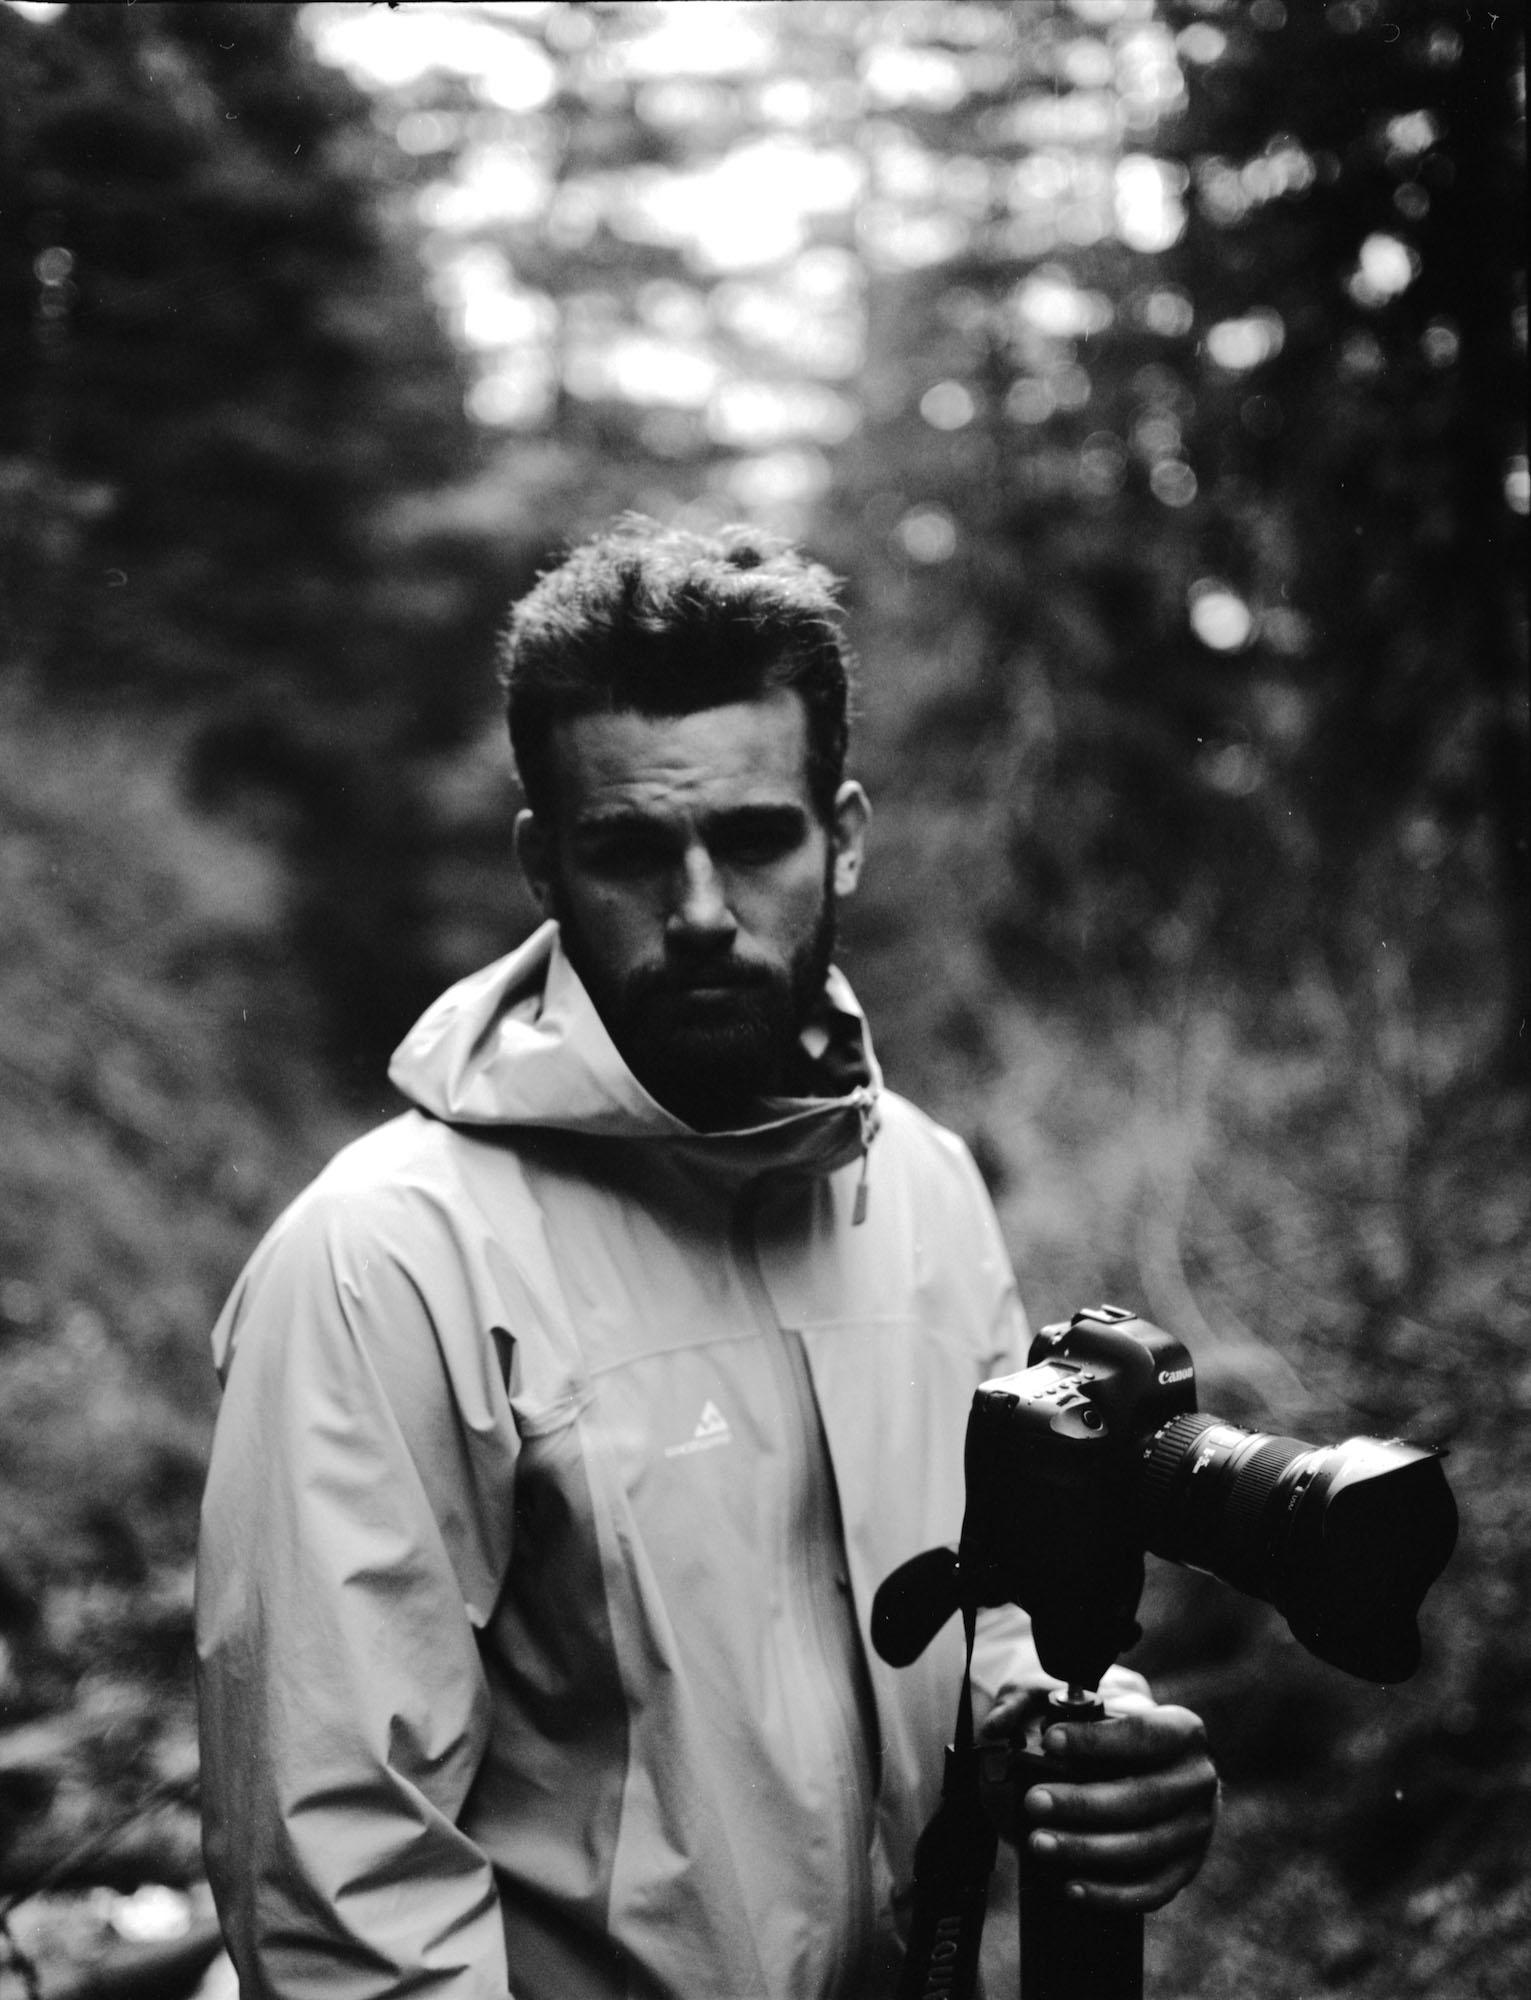 Jeff Spackman / Photo by Kyle Hooper